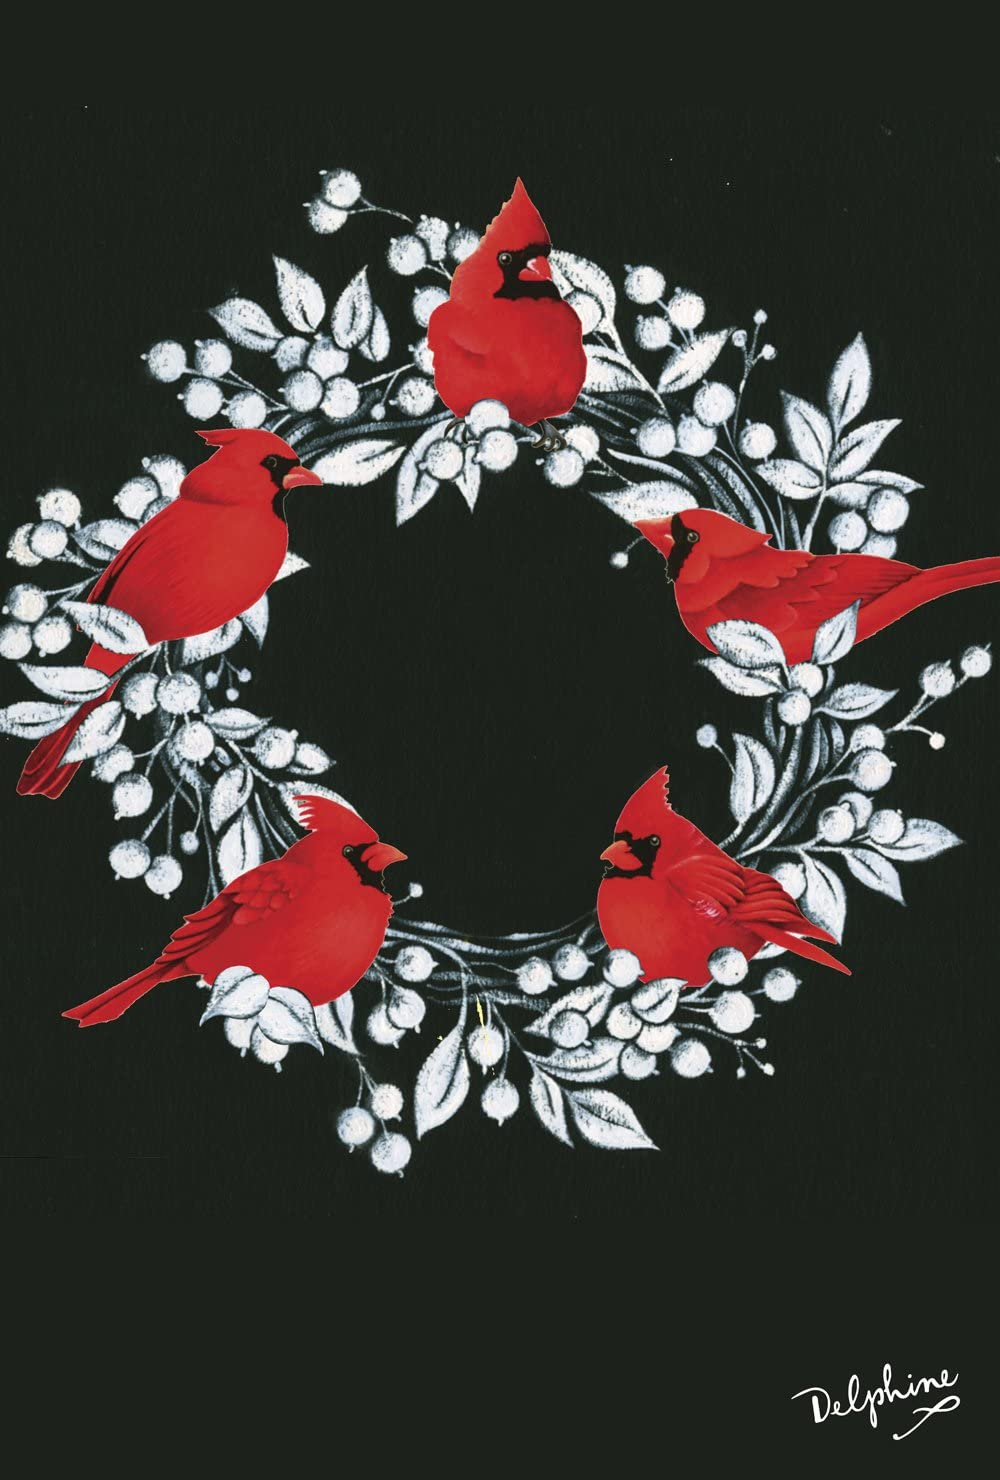 Toland Home Garden Cardinal Wreath 28 x 40 Inch Decorative Christmas Holiday Winter Bird House Flag - 1010837